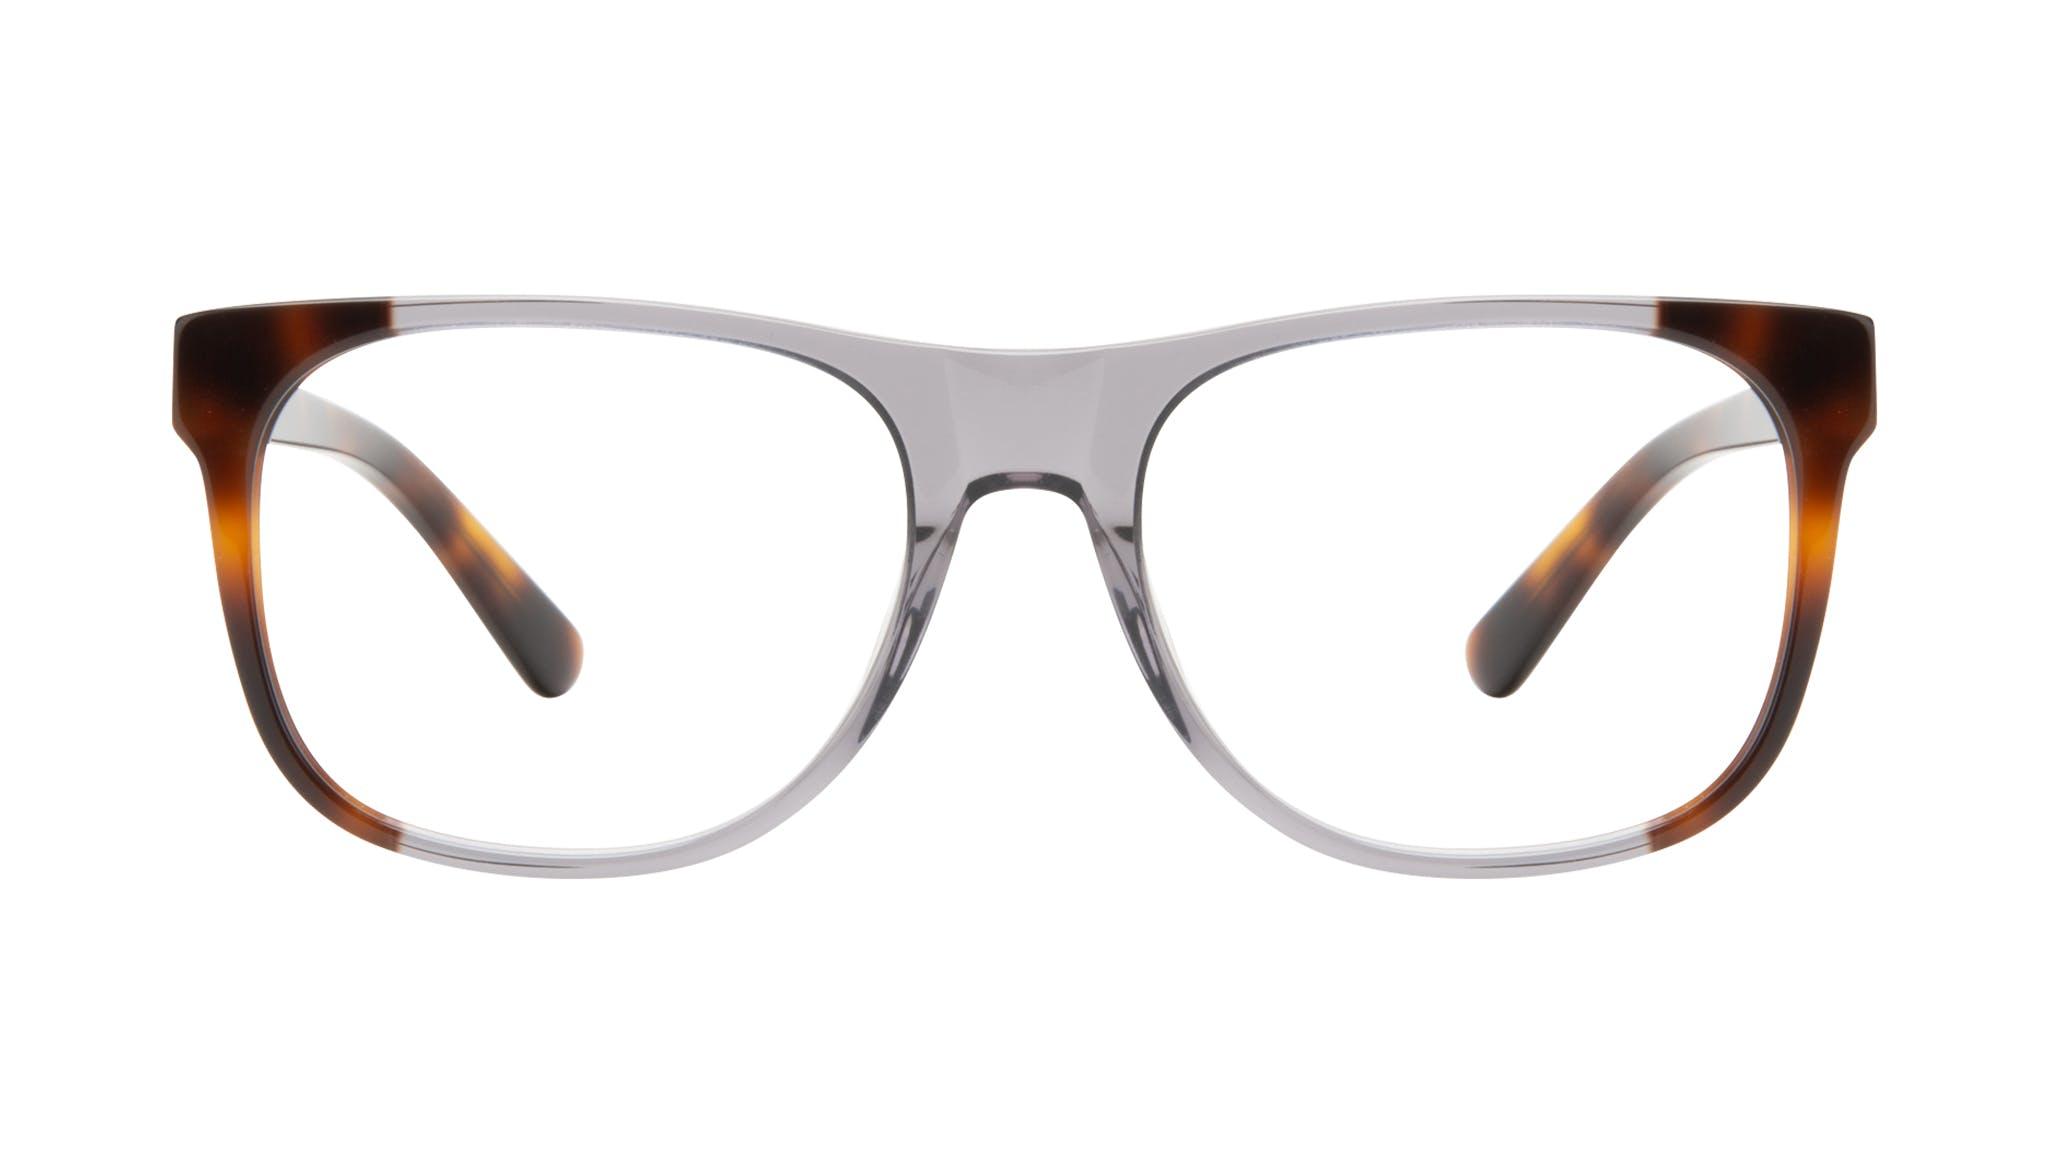 Affordable Fashion Glasses Square Eyeglasses Men Make Smokey Tort Front